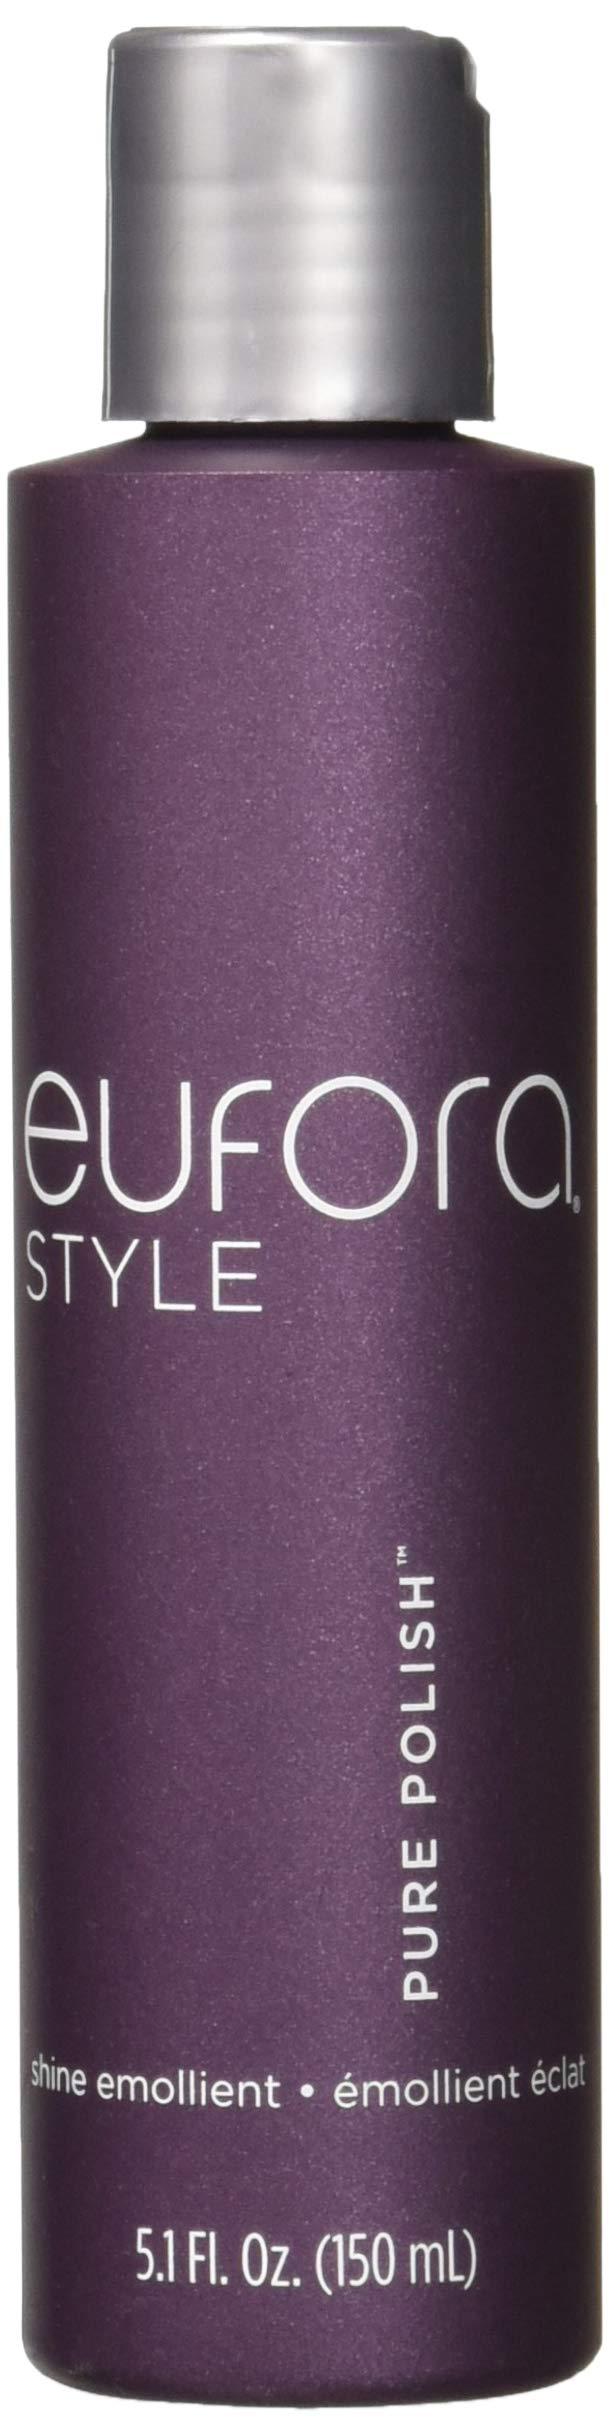 Eufora Style Pure Polish 5.1 Oz by Eufora